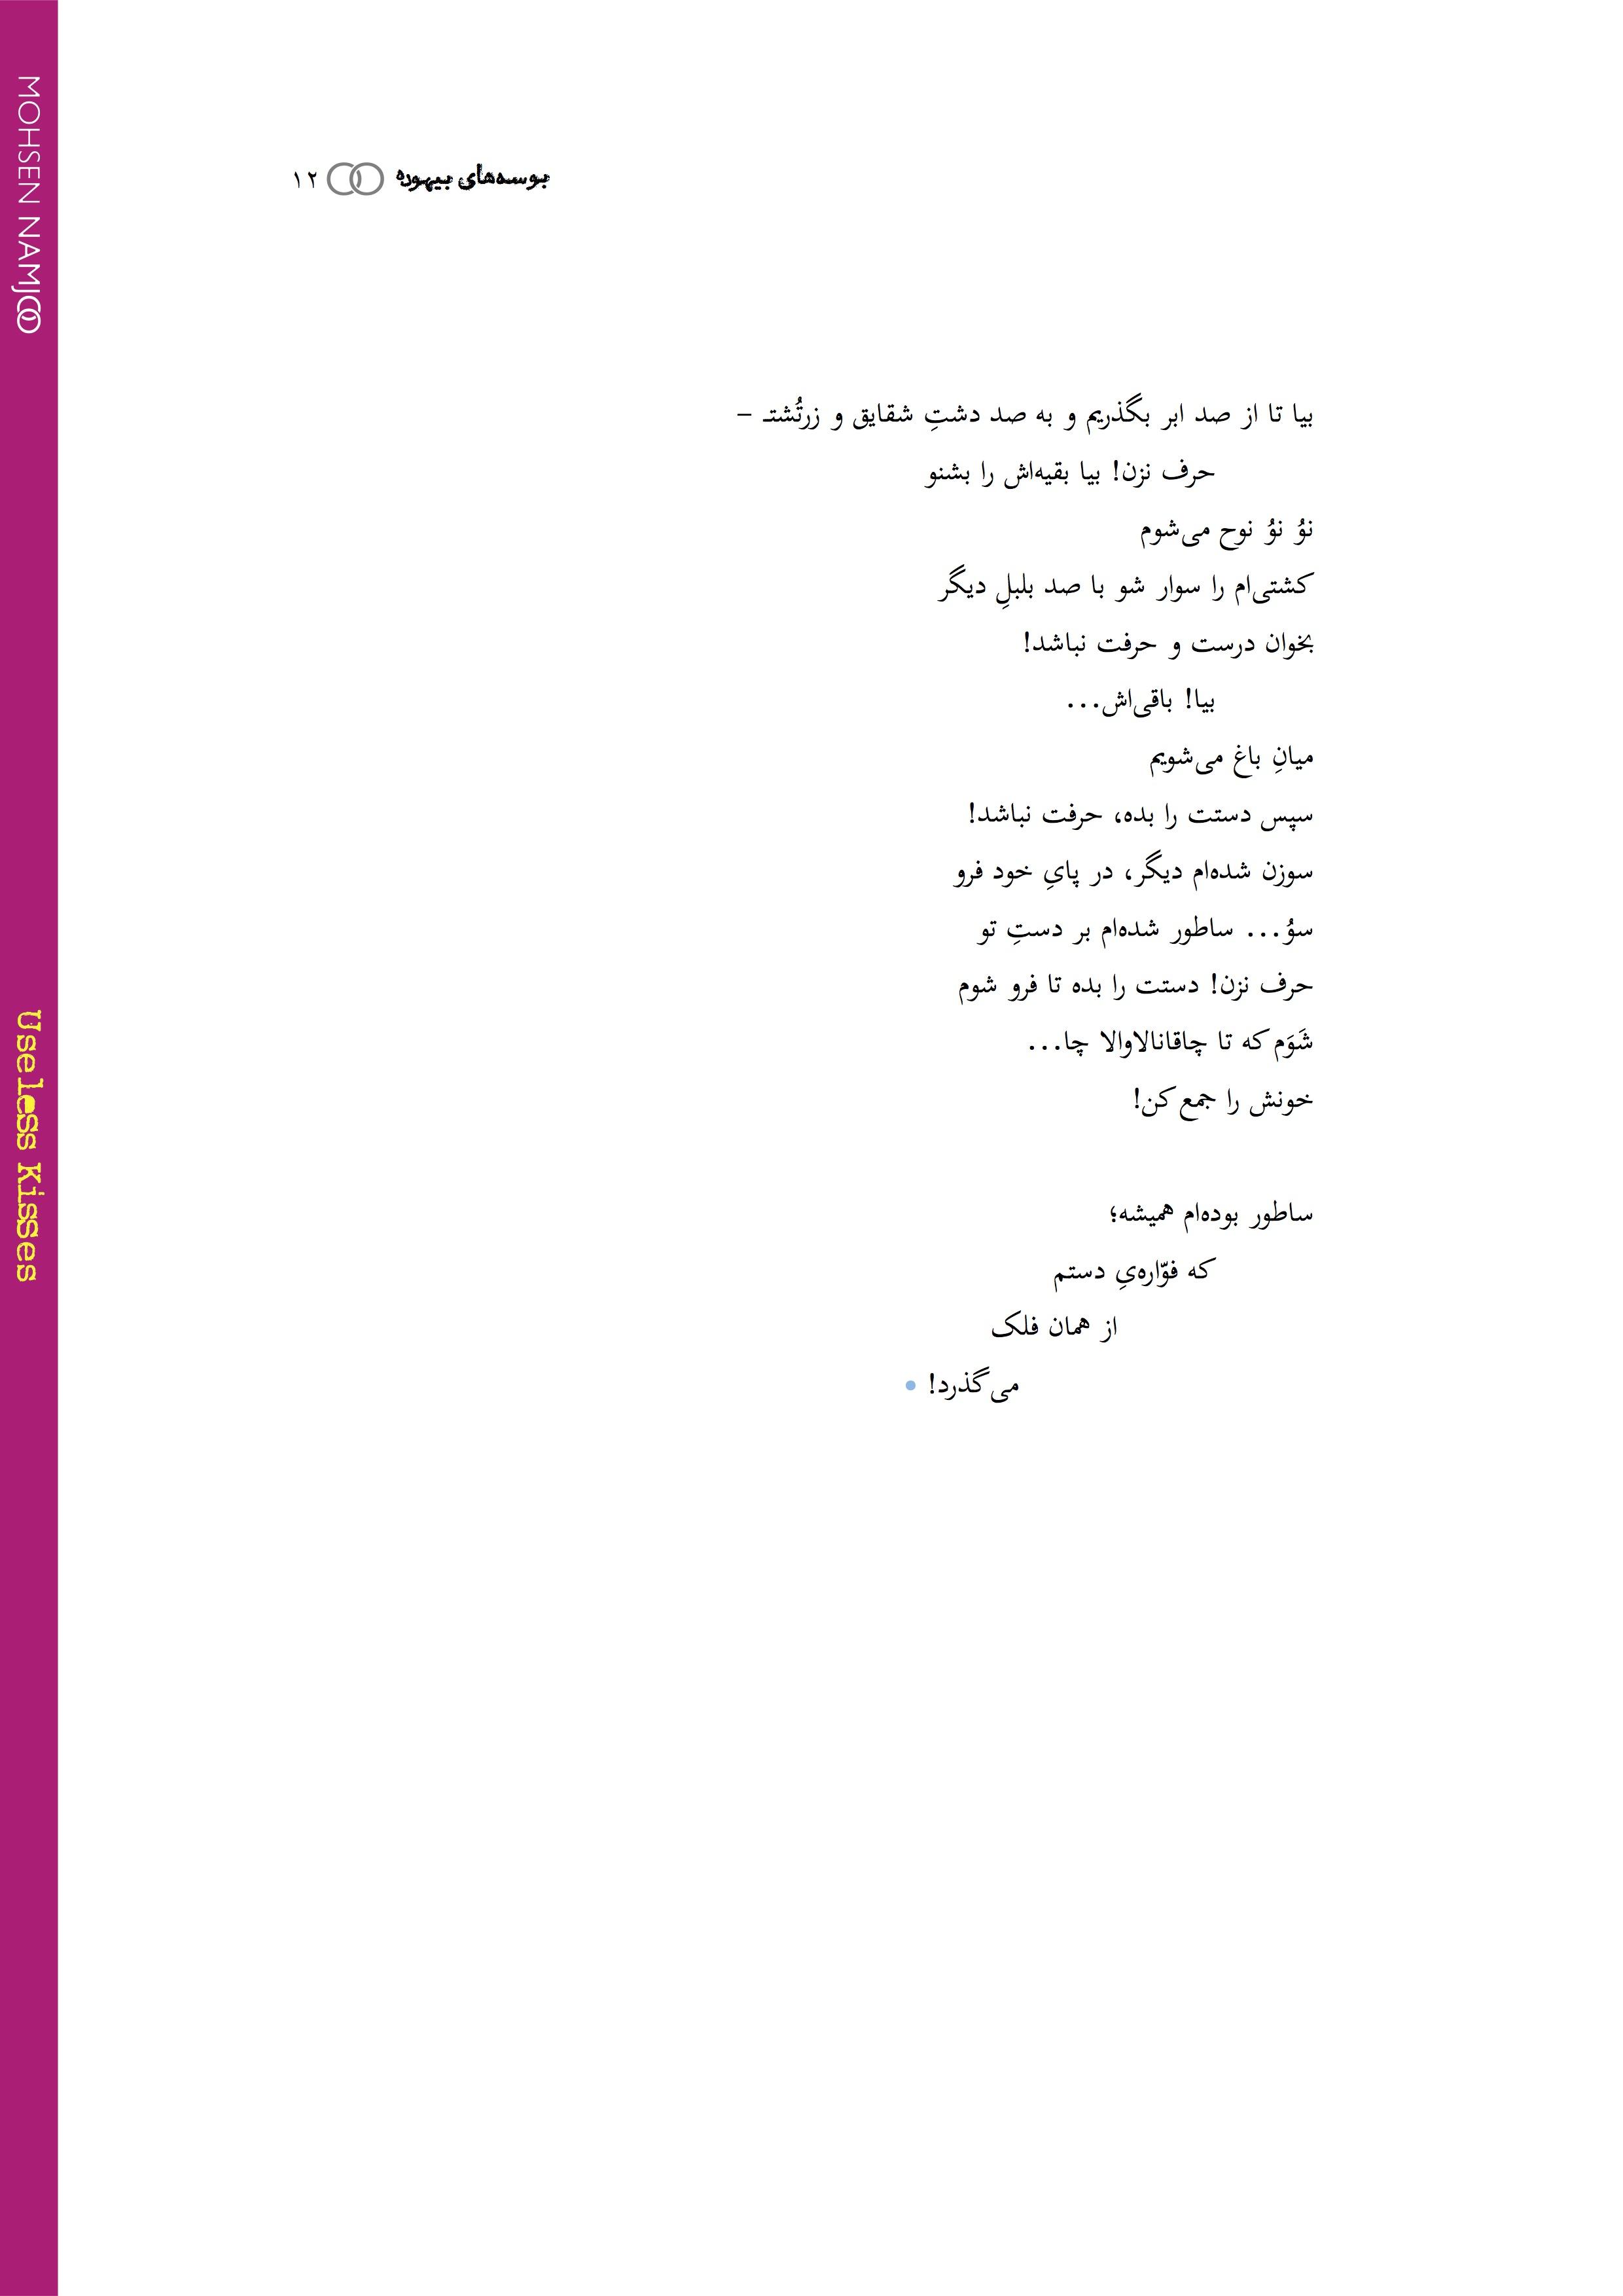 11Useless Kisses eBook (2nd Edition).jpg